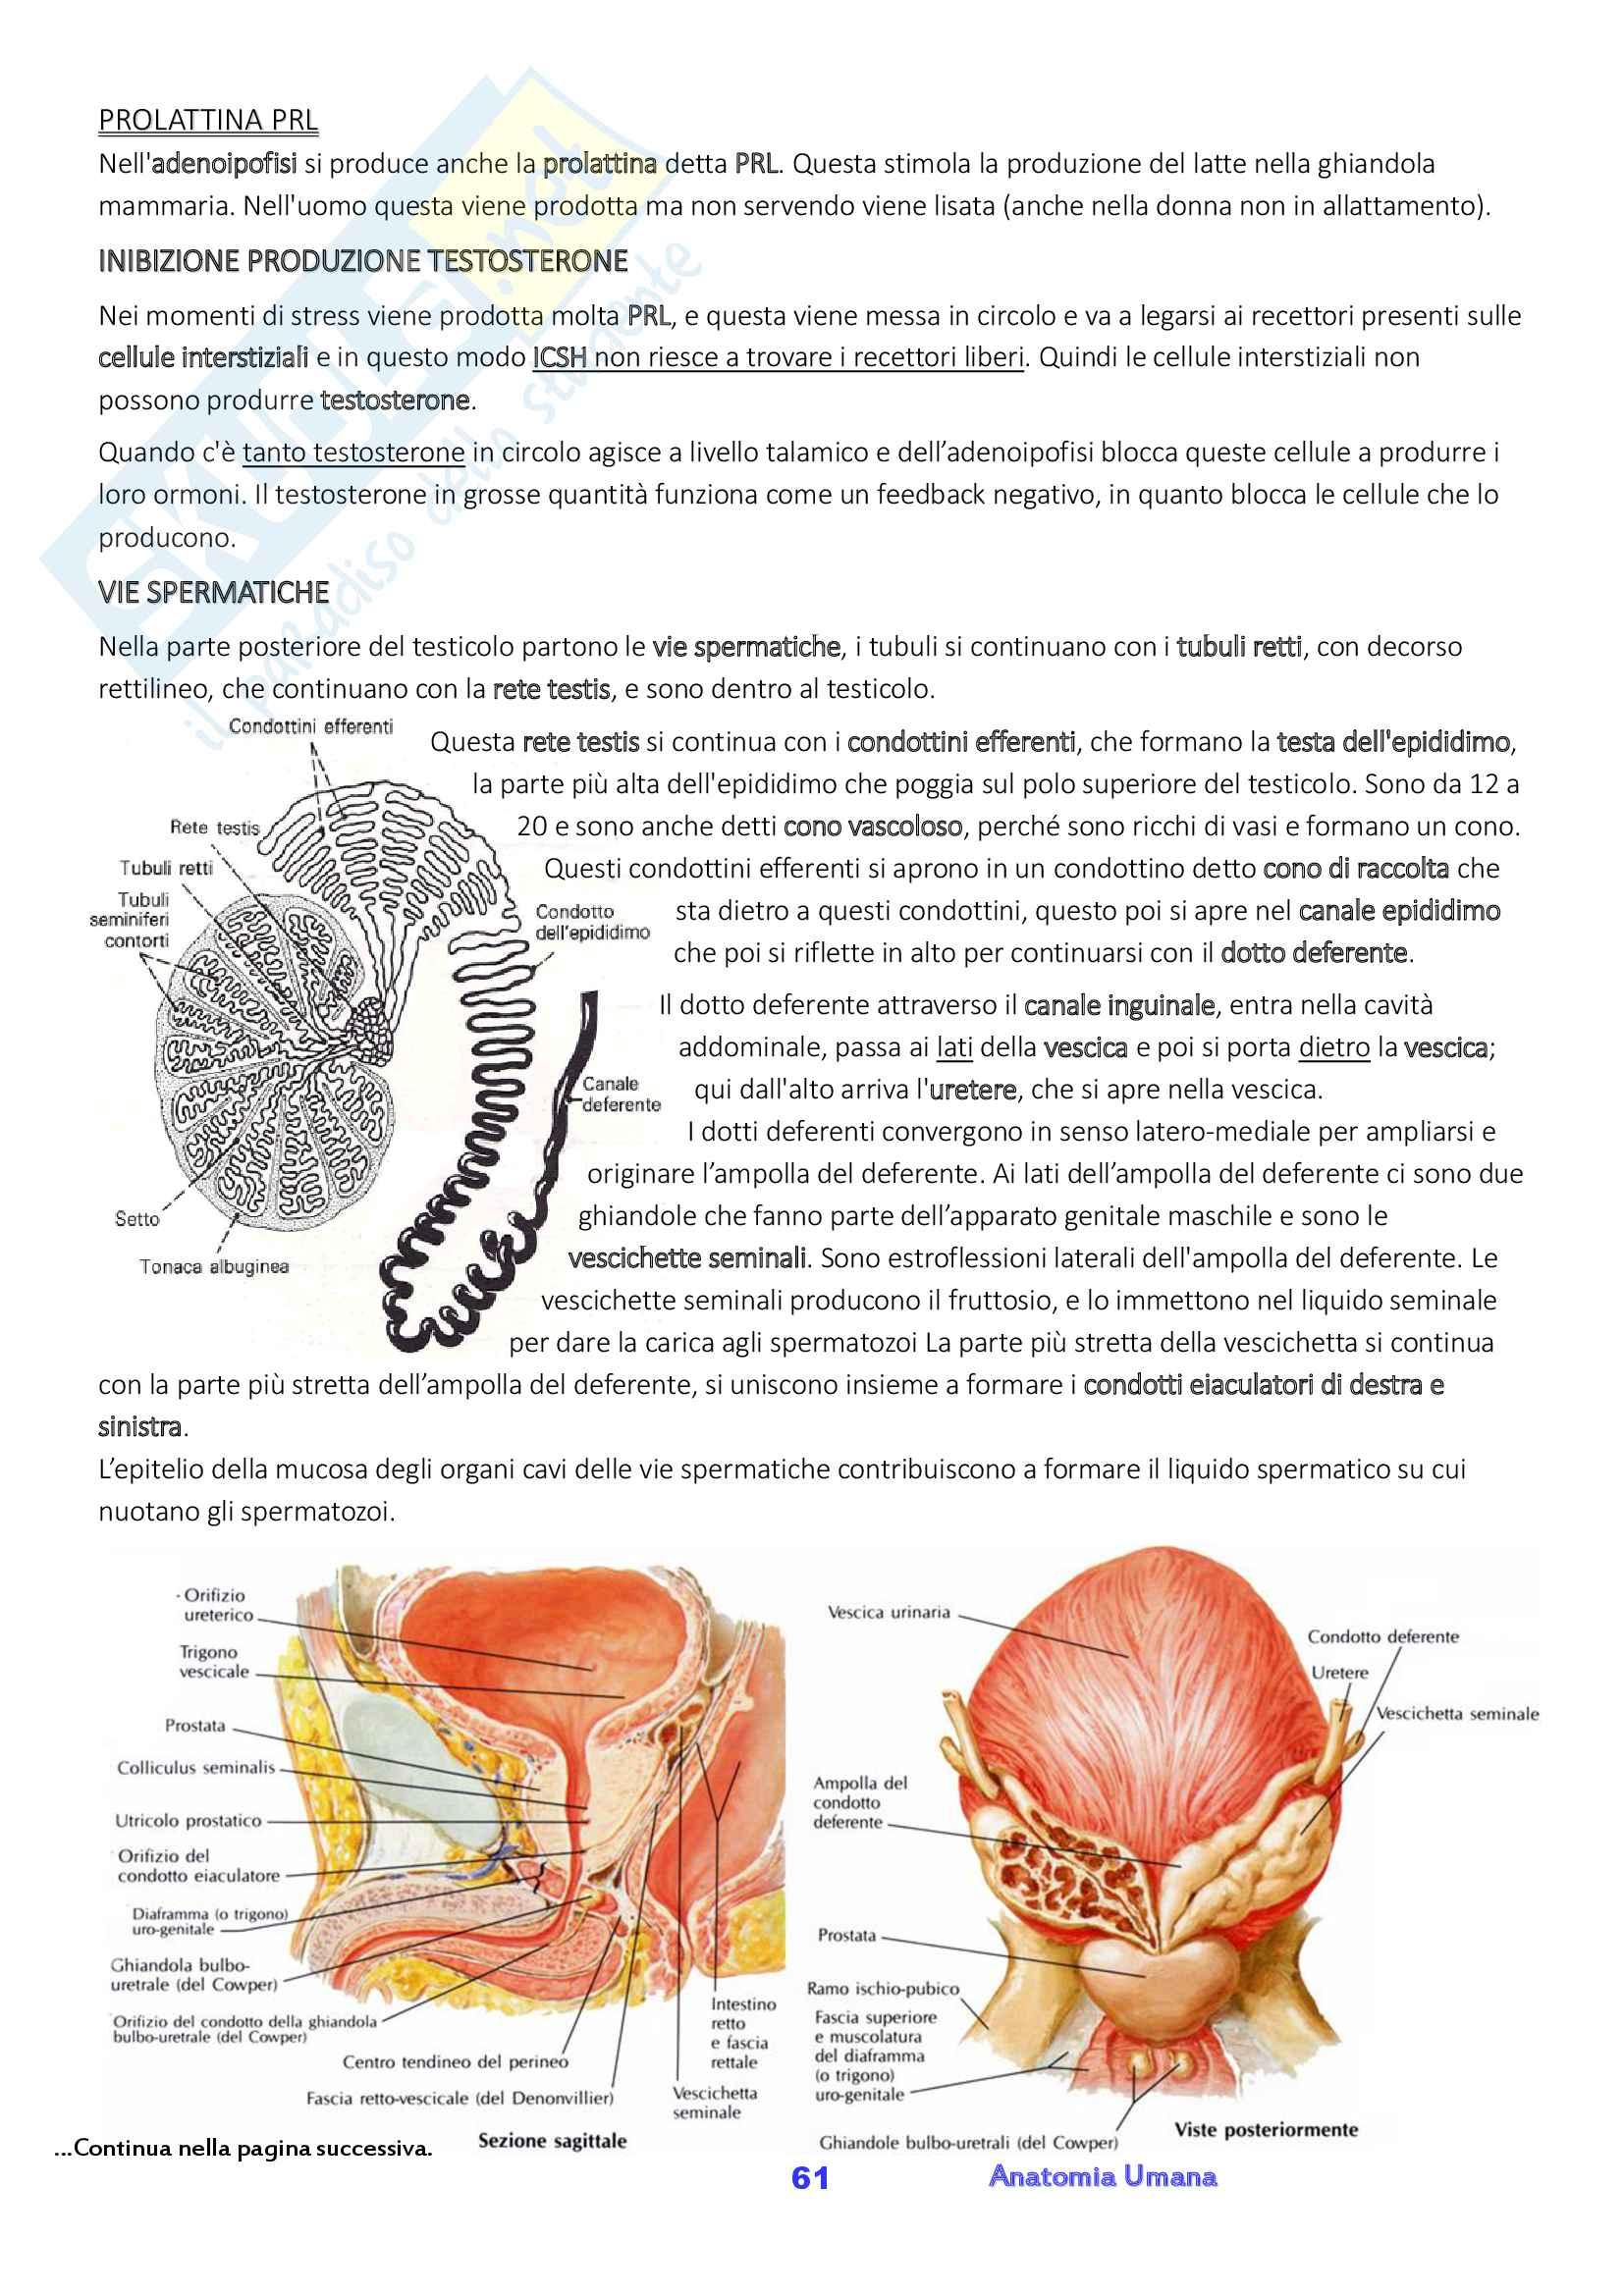 Anatomia umana, Appunti, Prof.ssa Ferretti Pag. 61